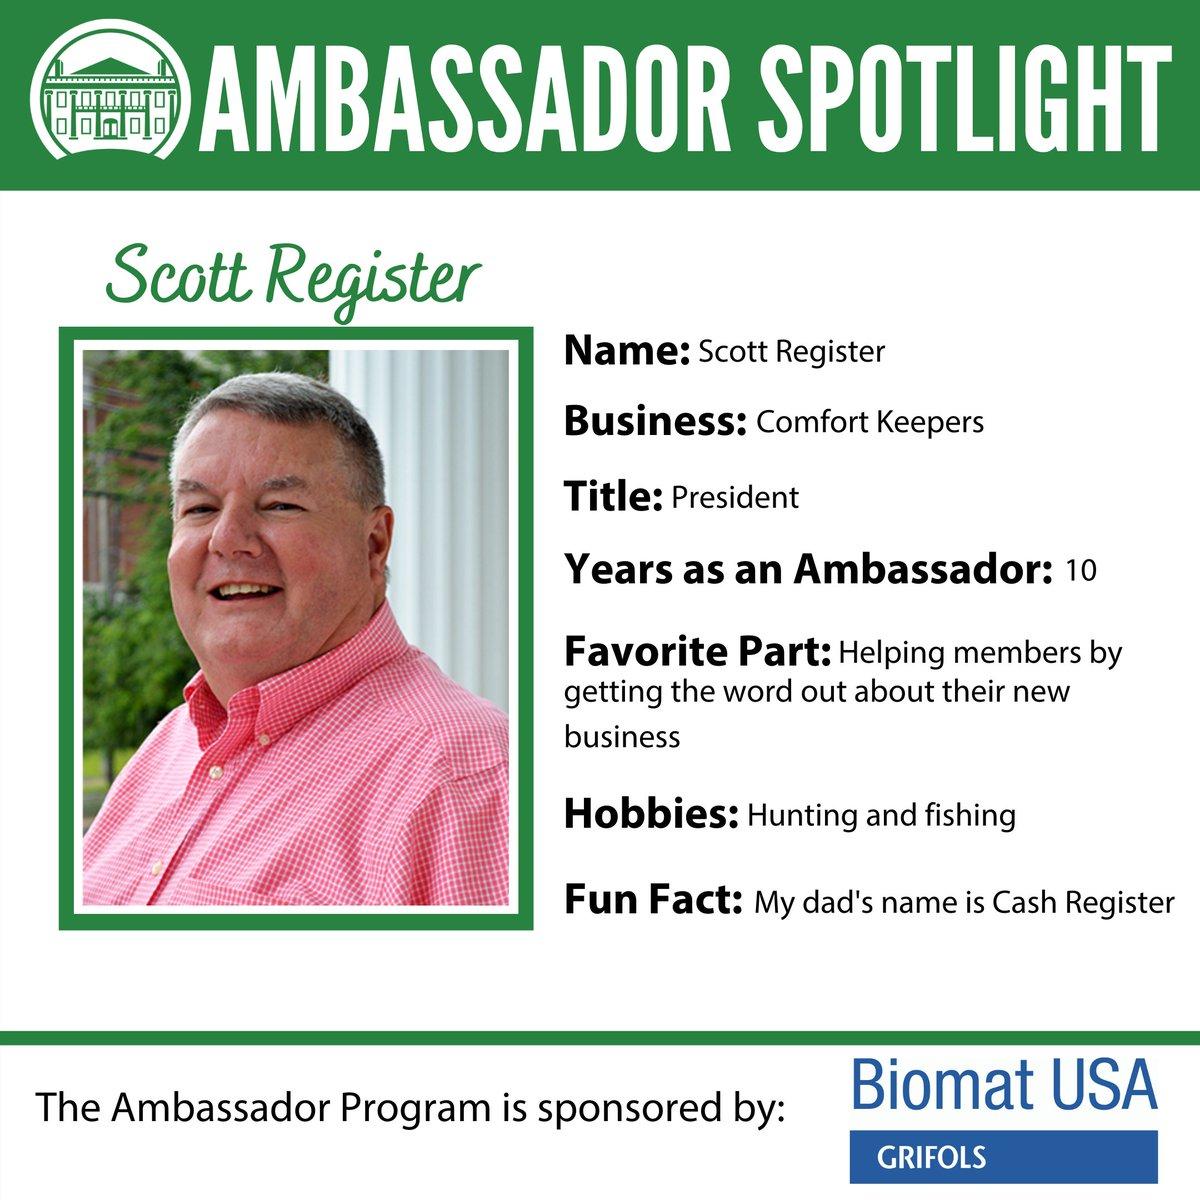 Get to know the friendly faces behind the green blazers! Meet Scott! #ValdostaChamberAmbassadors #Ambassadors